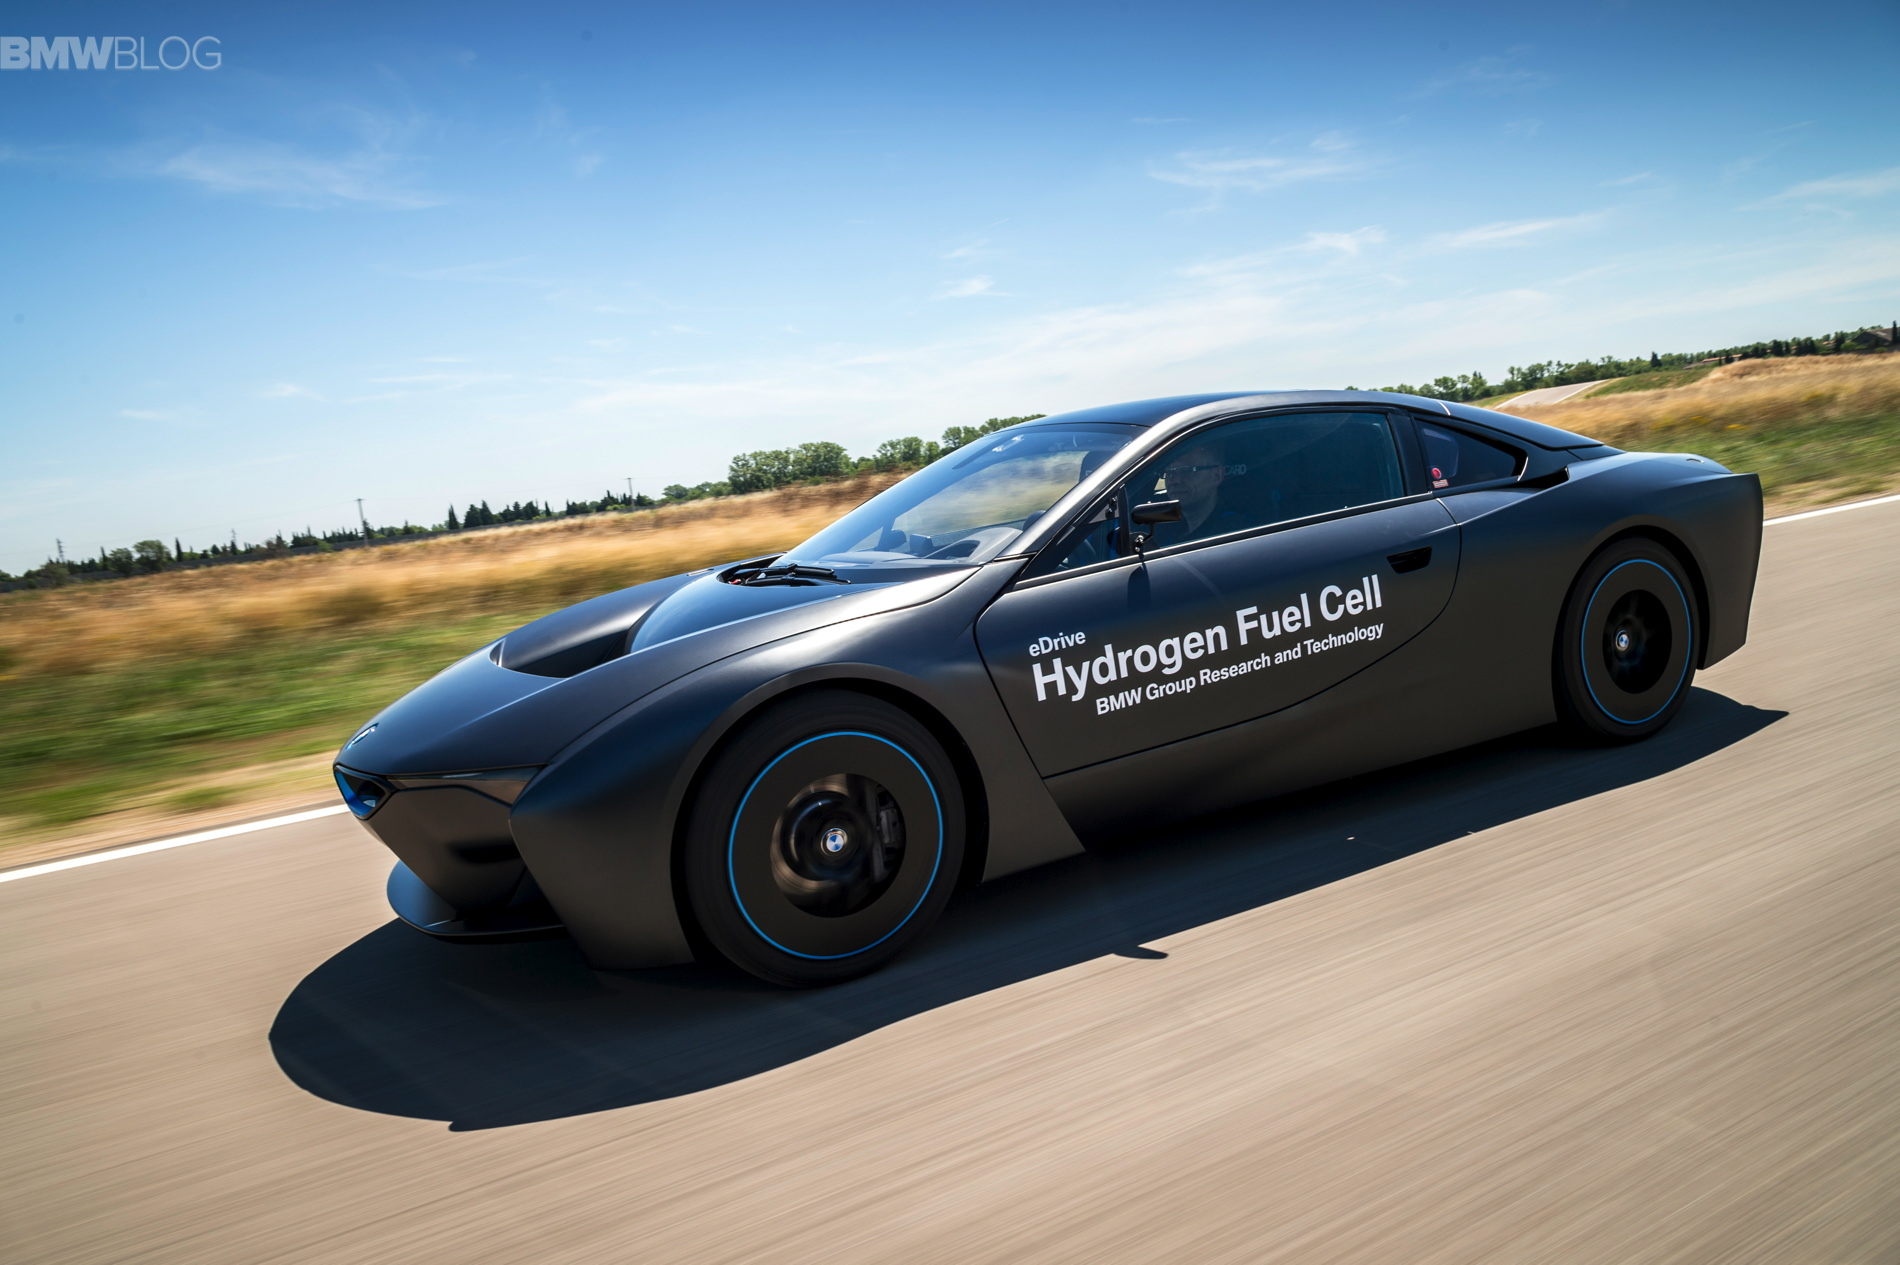 BMW i8 hydrogen fuel cell images 01